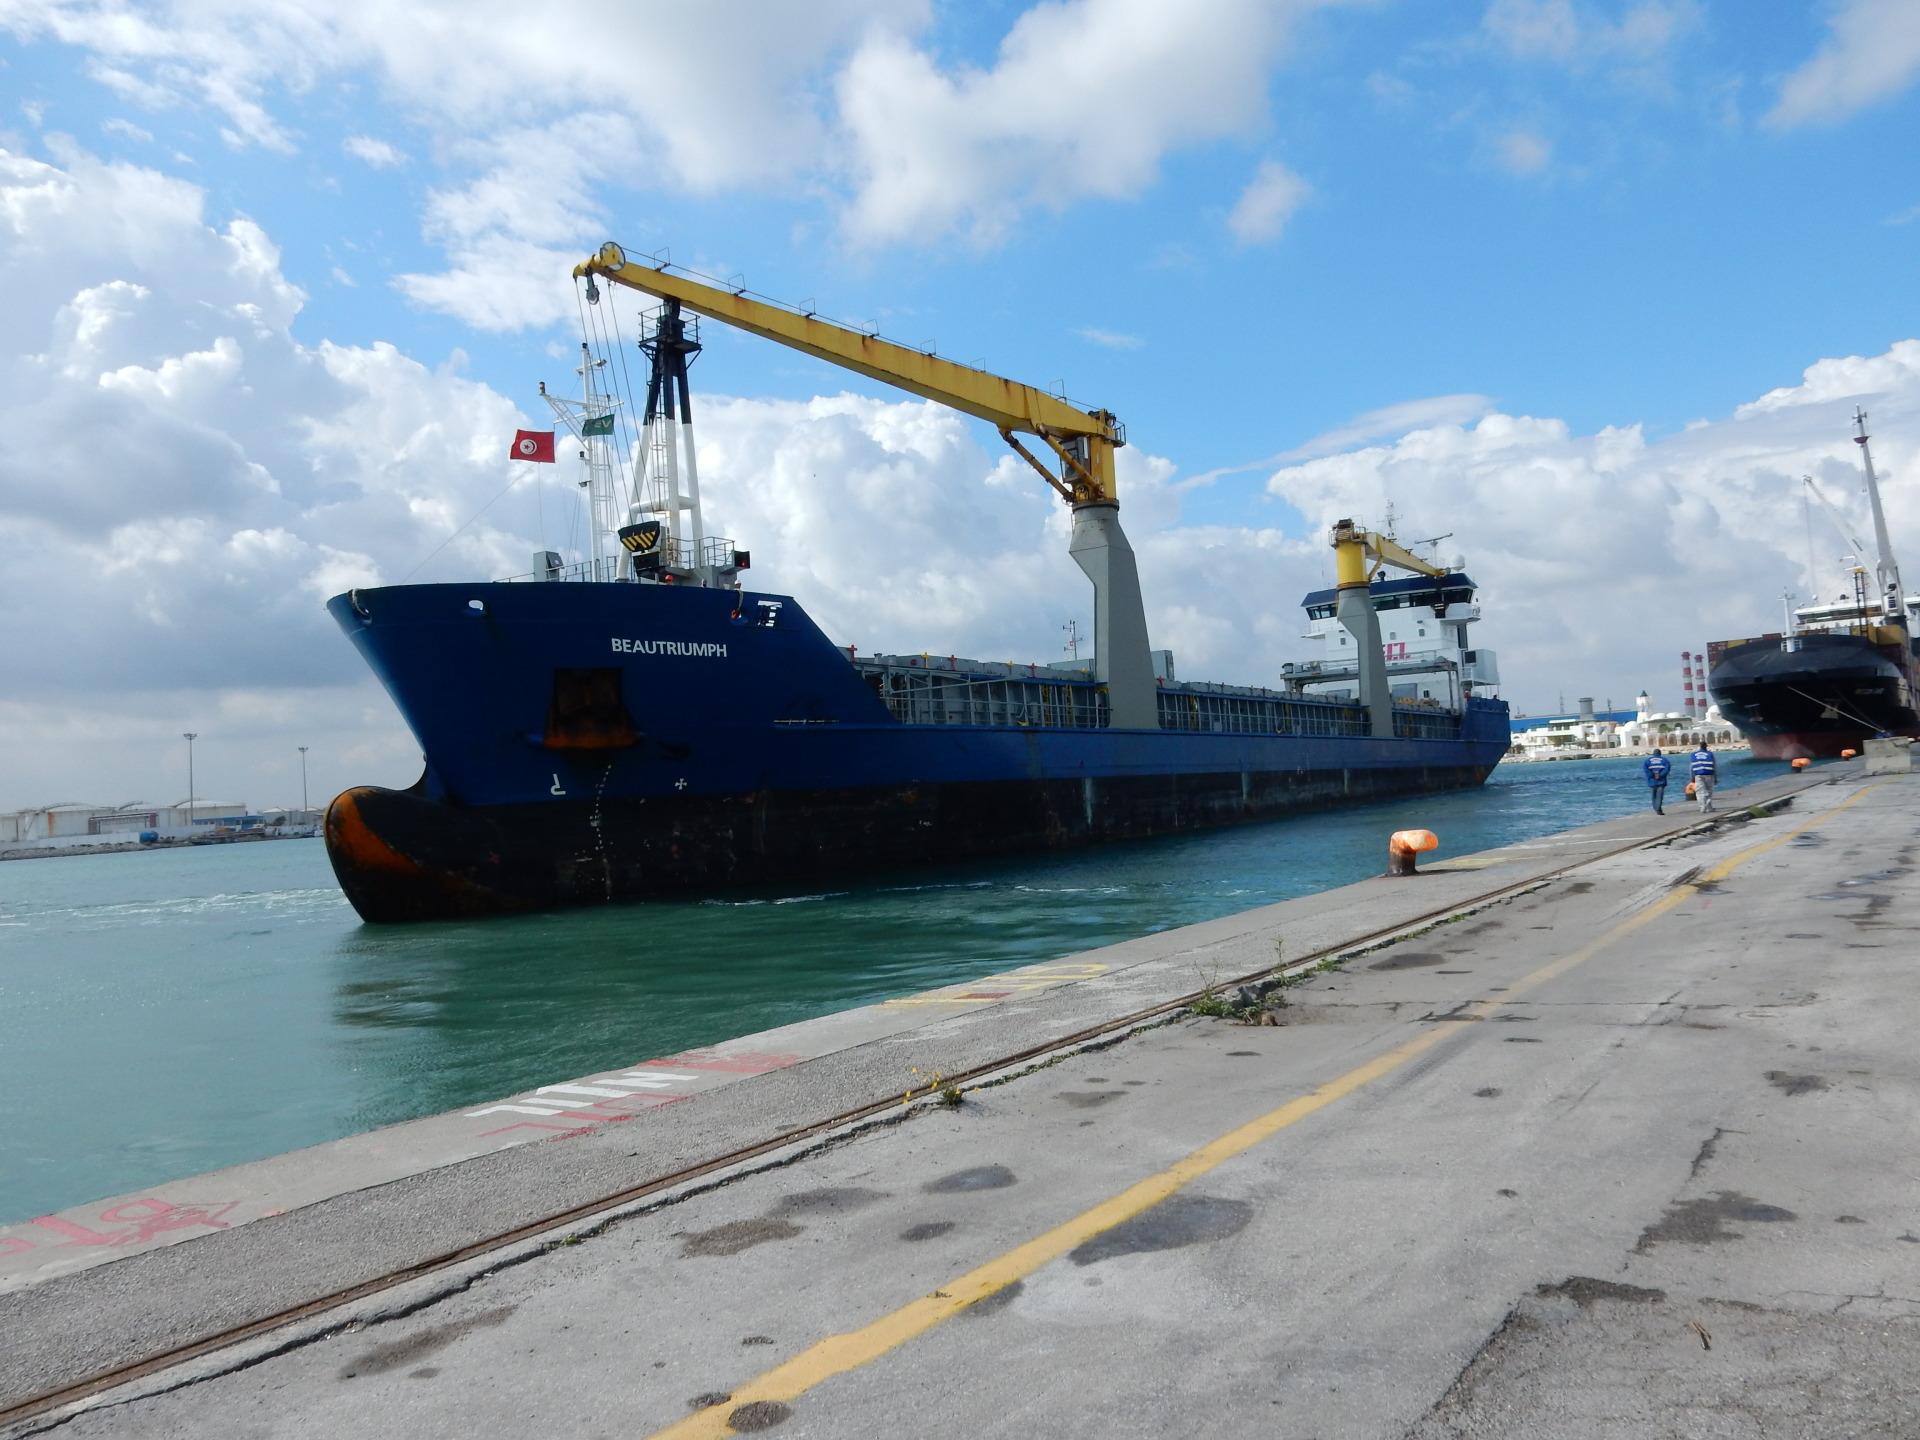 Rades Port